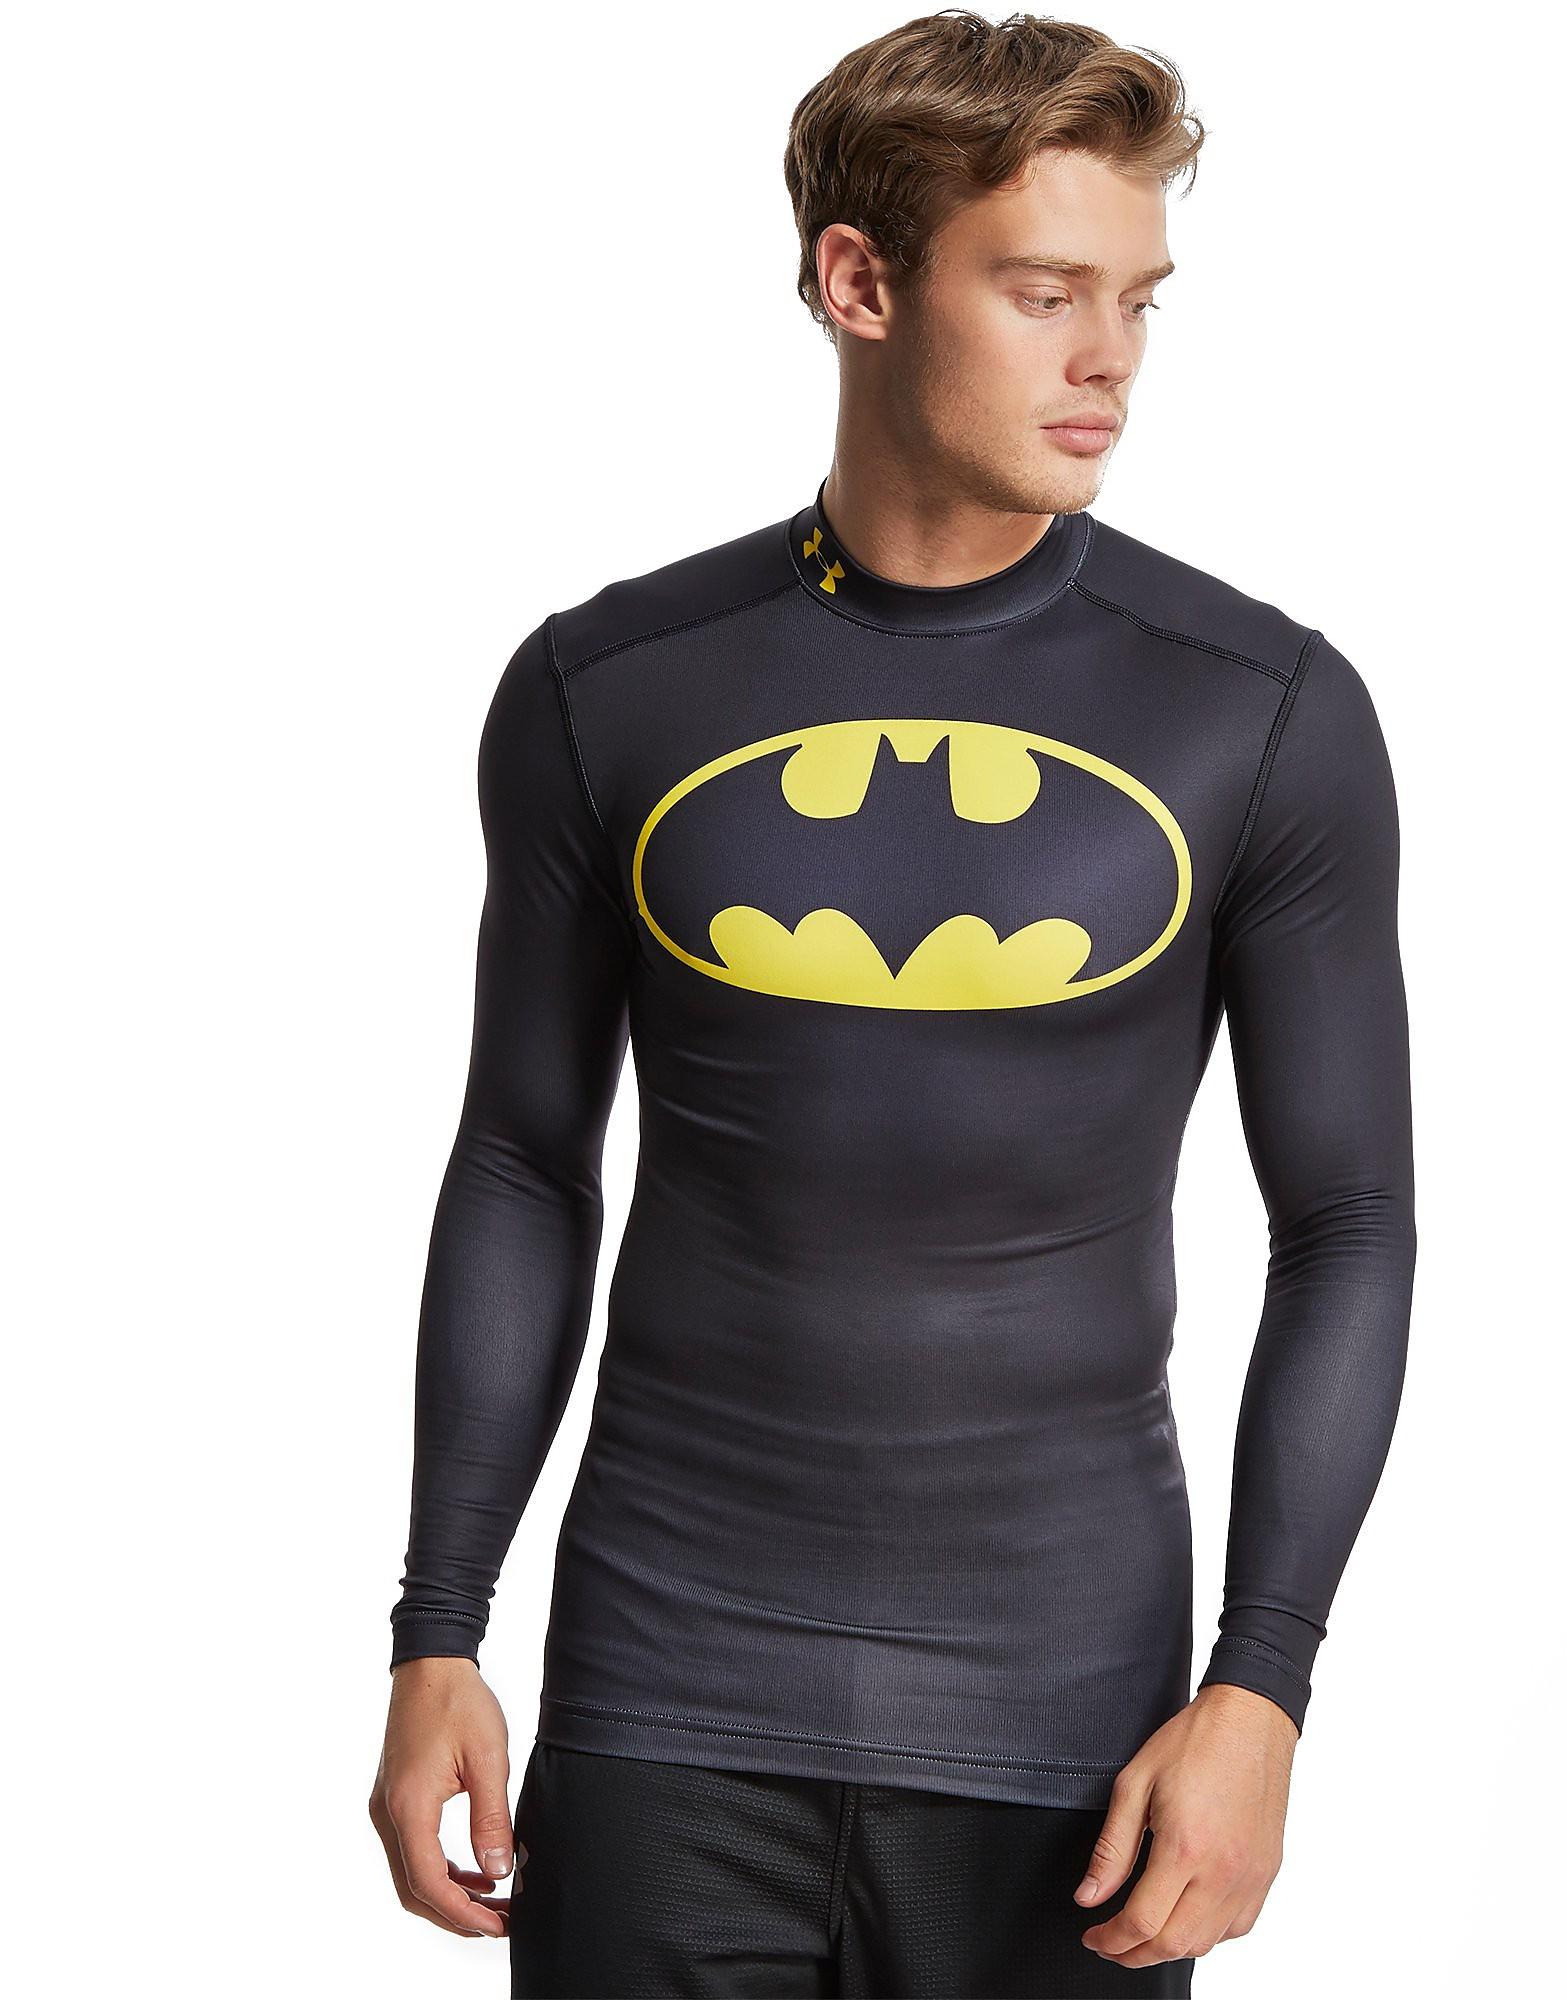 Under Armour Batman GoldGear Compression Longsleeve